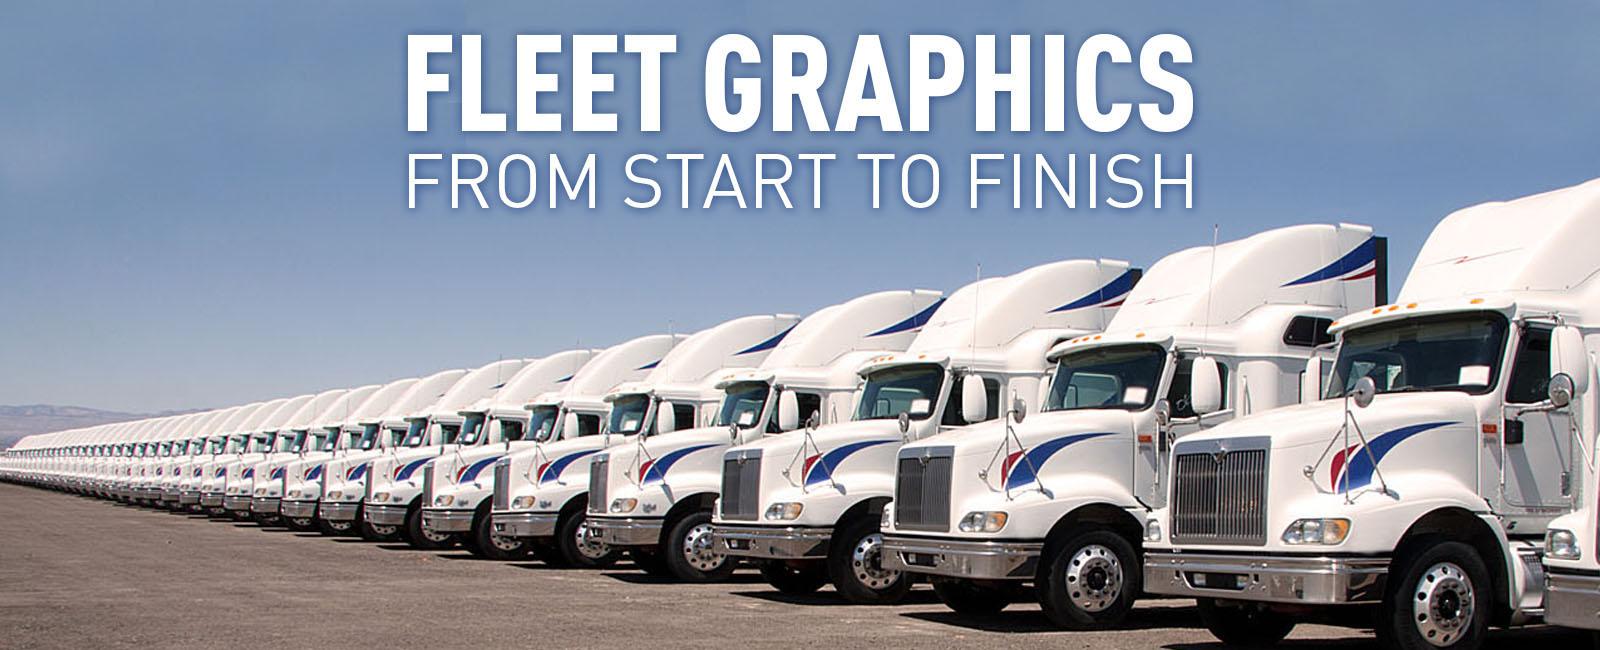 Full-Service Fleet Graphics Provider